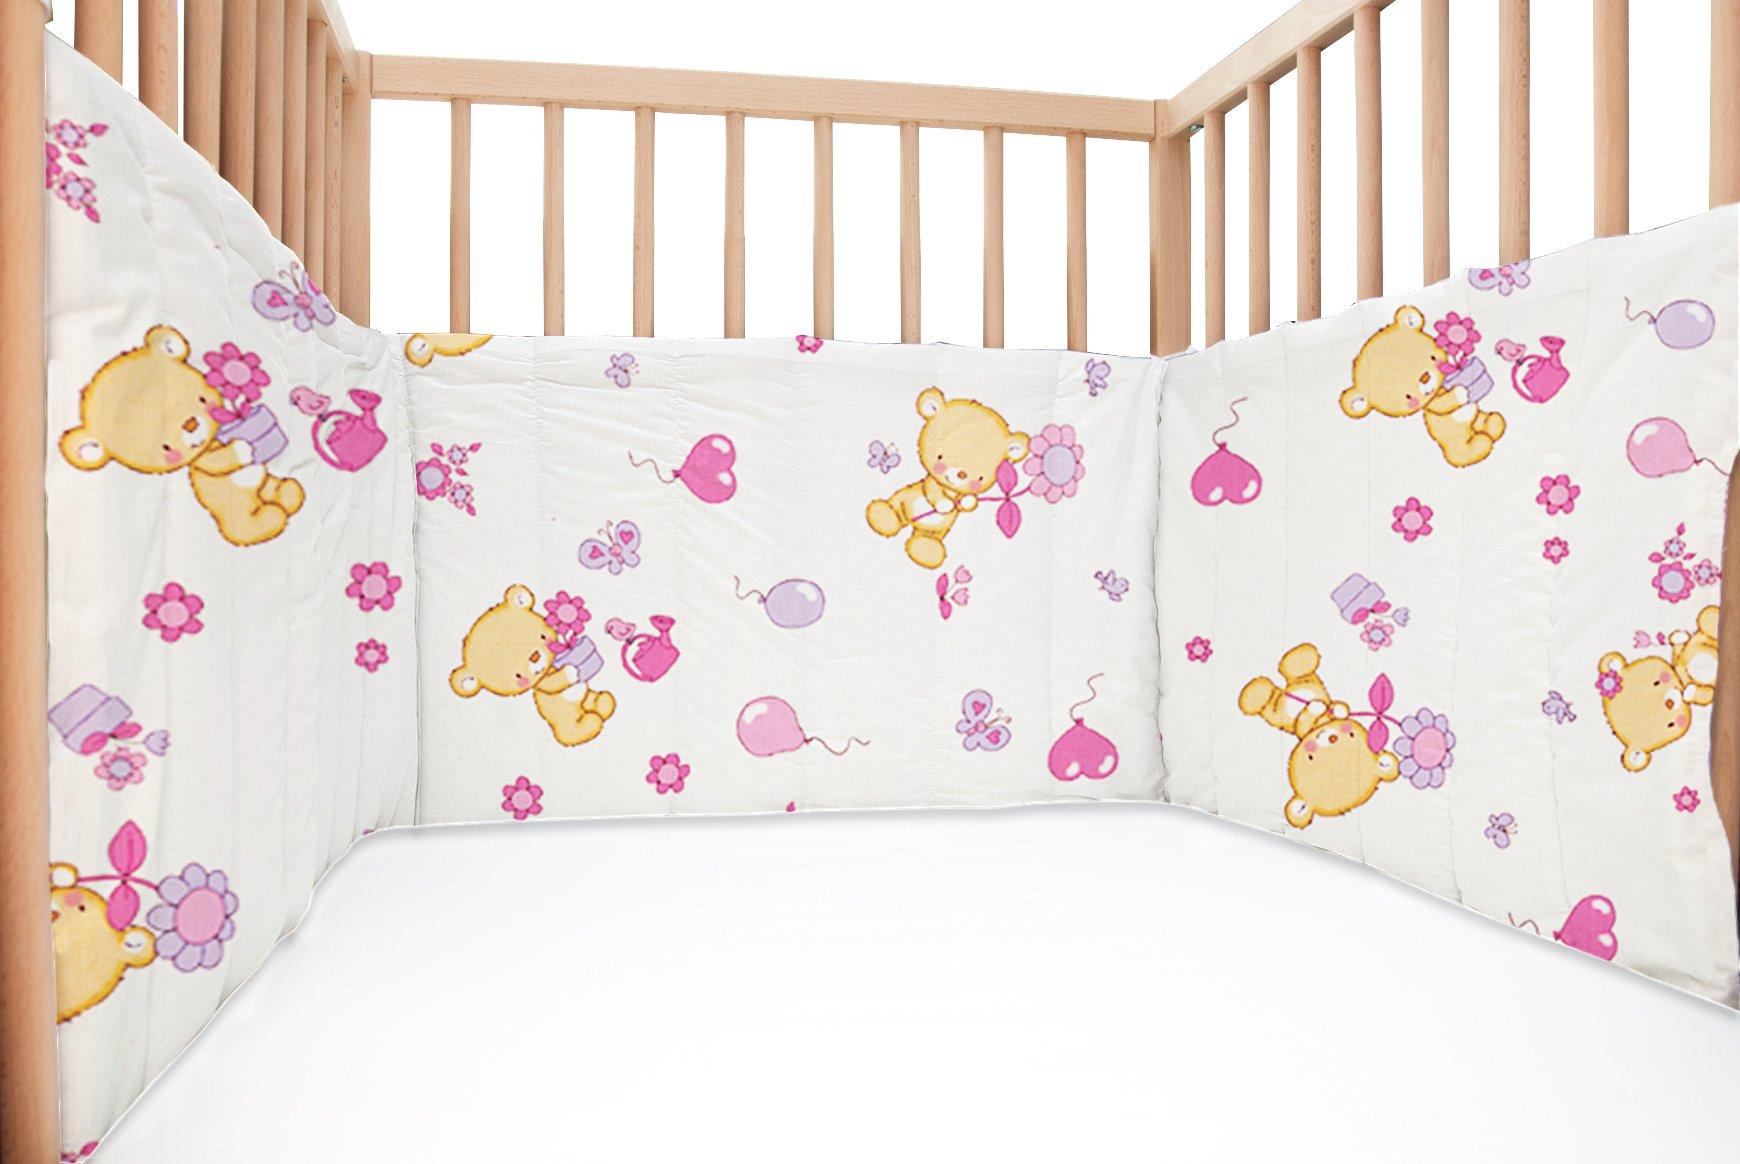 Baby Bears / SoulBedroom Cotton Cot Bumper Pad Half (210x40 cm)